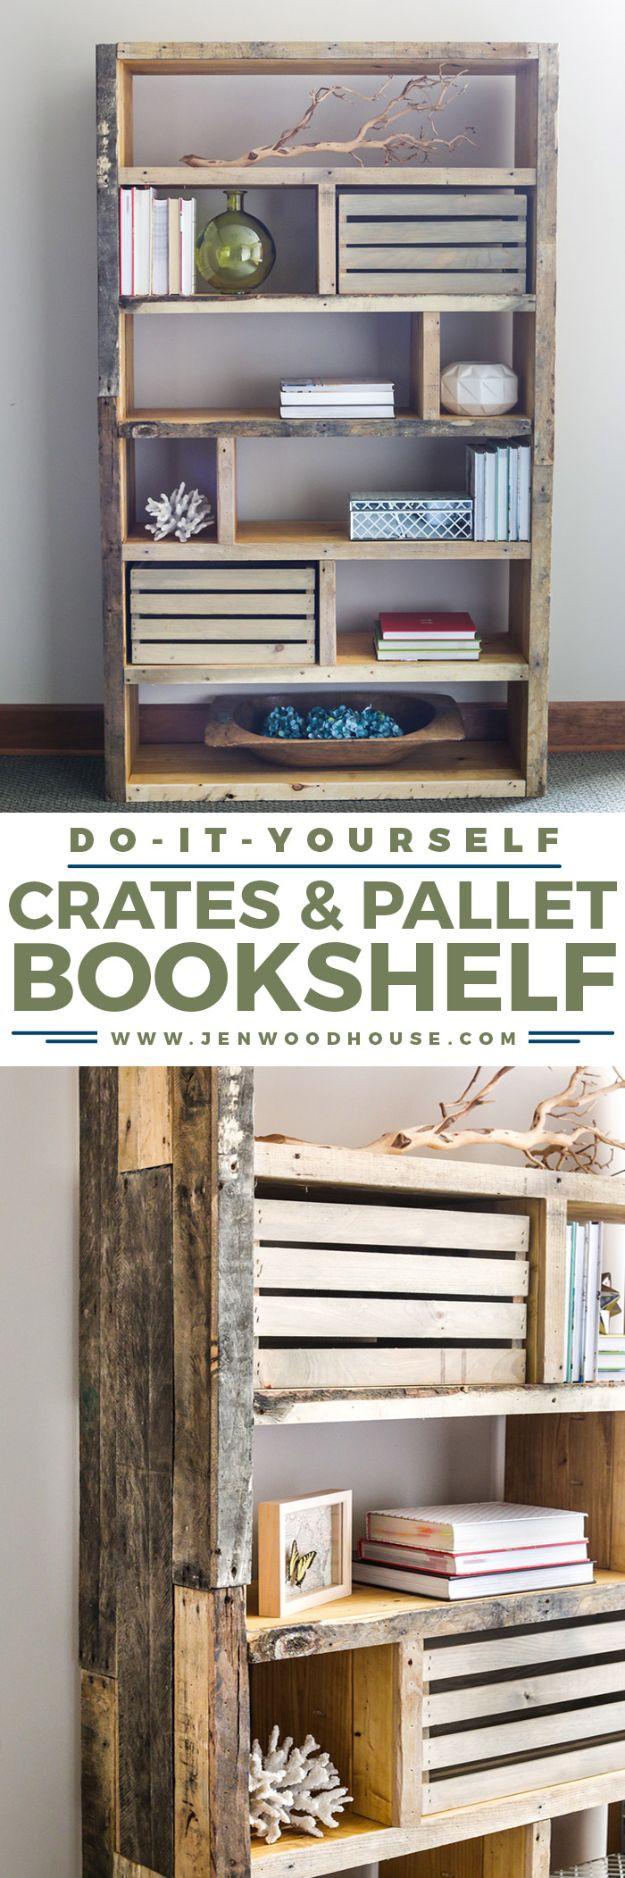 DIY Bookshelf Ideas - Rustic Bookshelf from Crates and Pallet - Crate and Pallets Book Shelf Pinterest - Cheap Farmhouse Home Decor Ideas